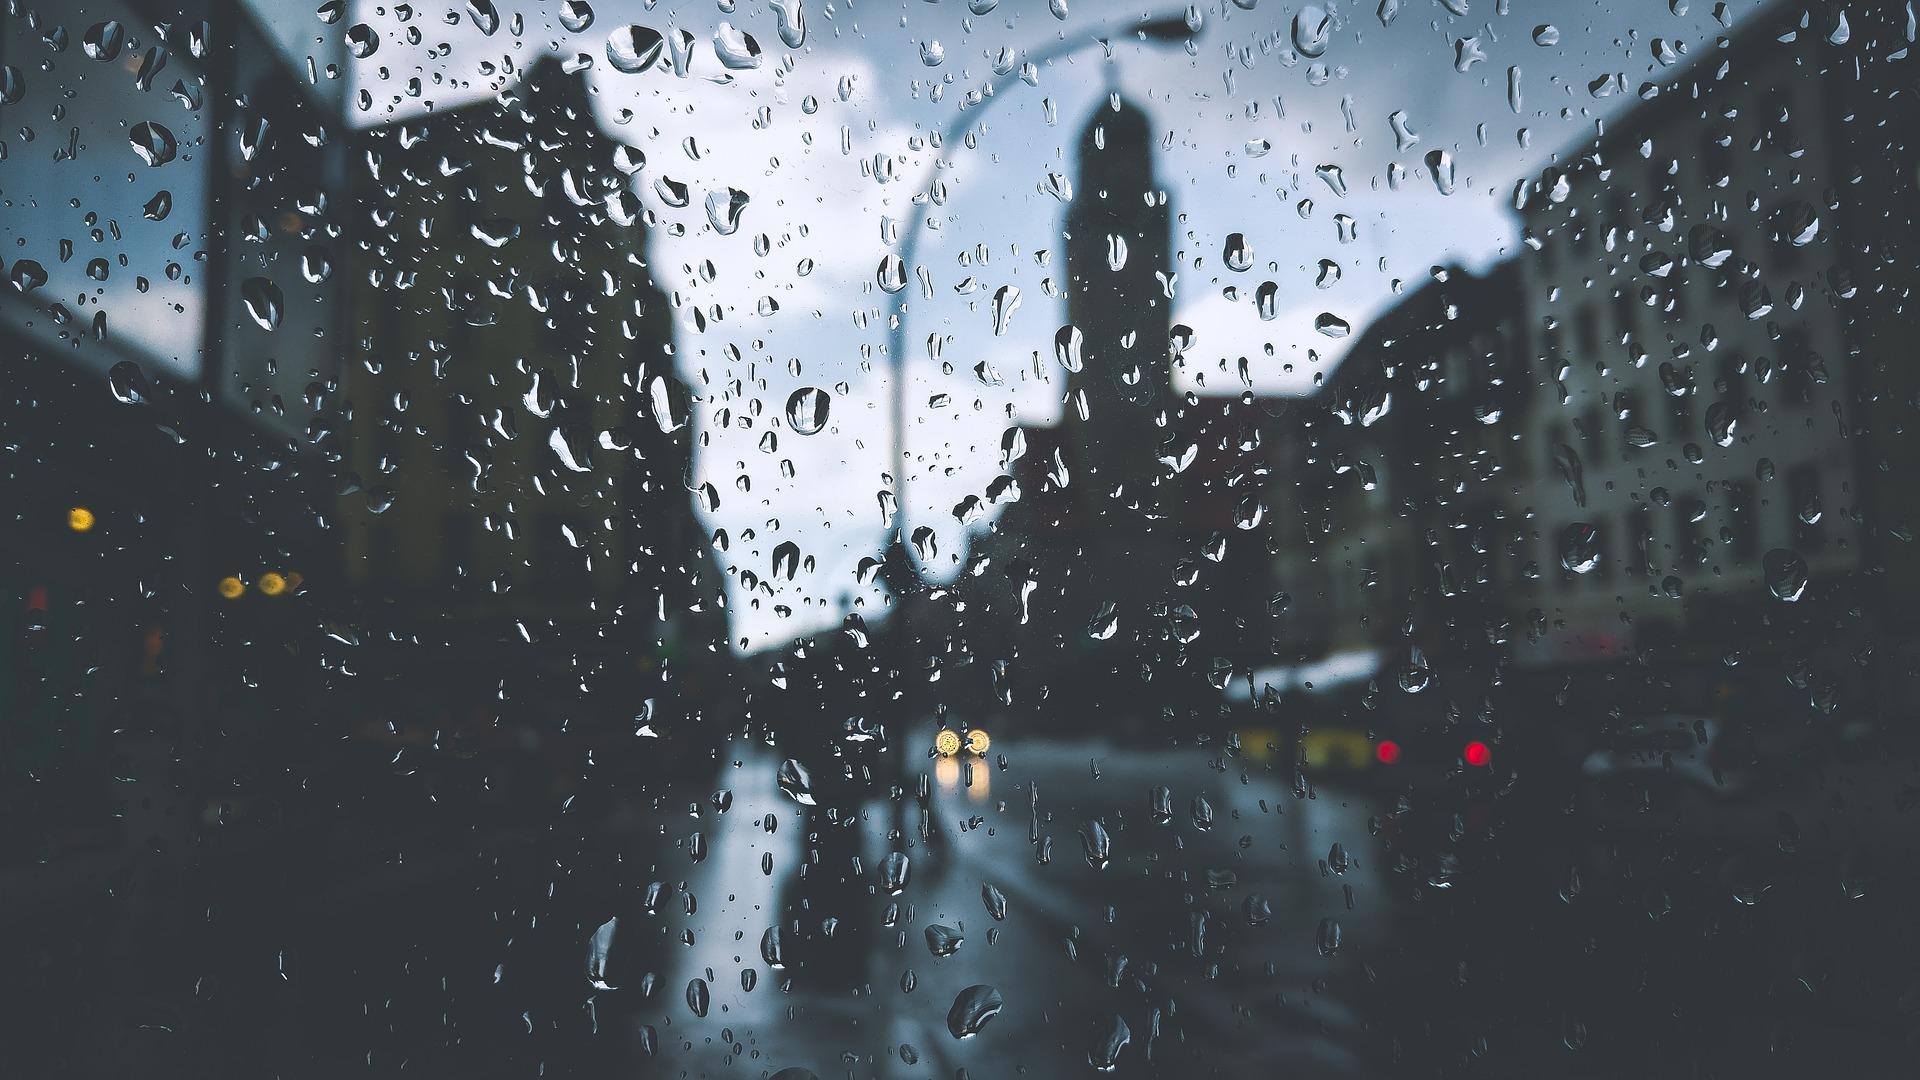 Jak fotit v dešti